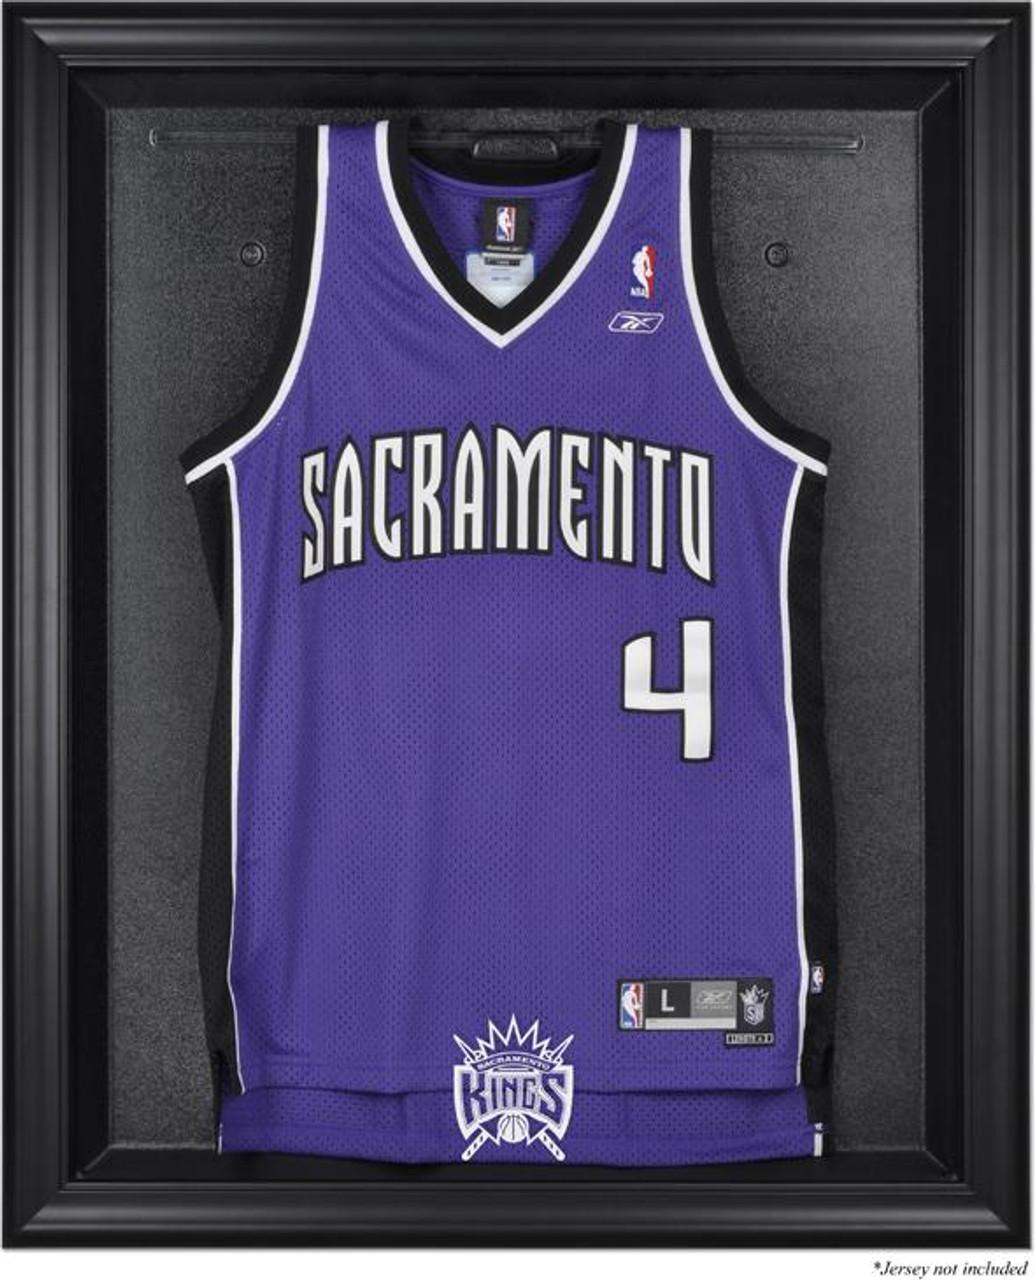 a9a2ba9ba1a Sacramento Kings Black Framed Jersey Display Case